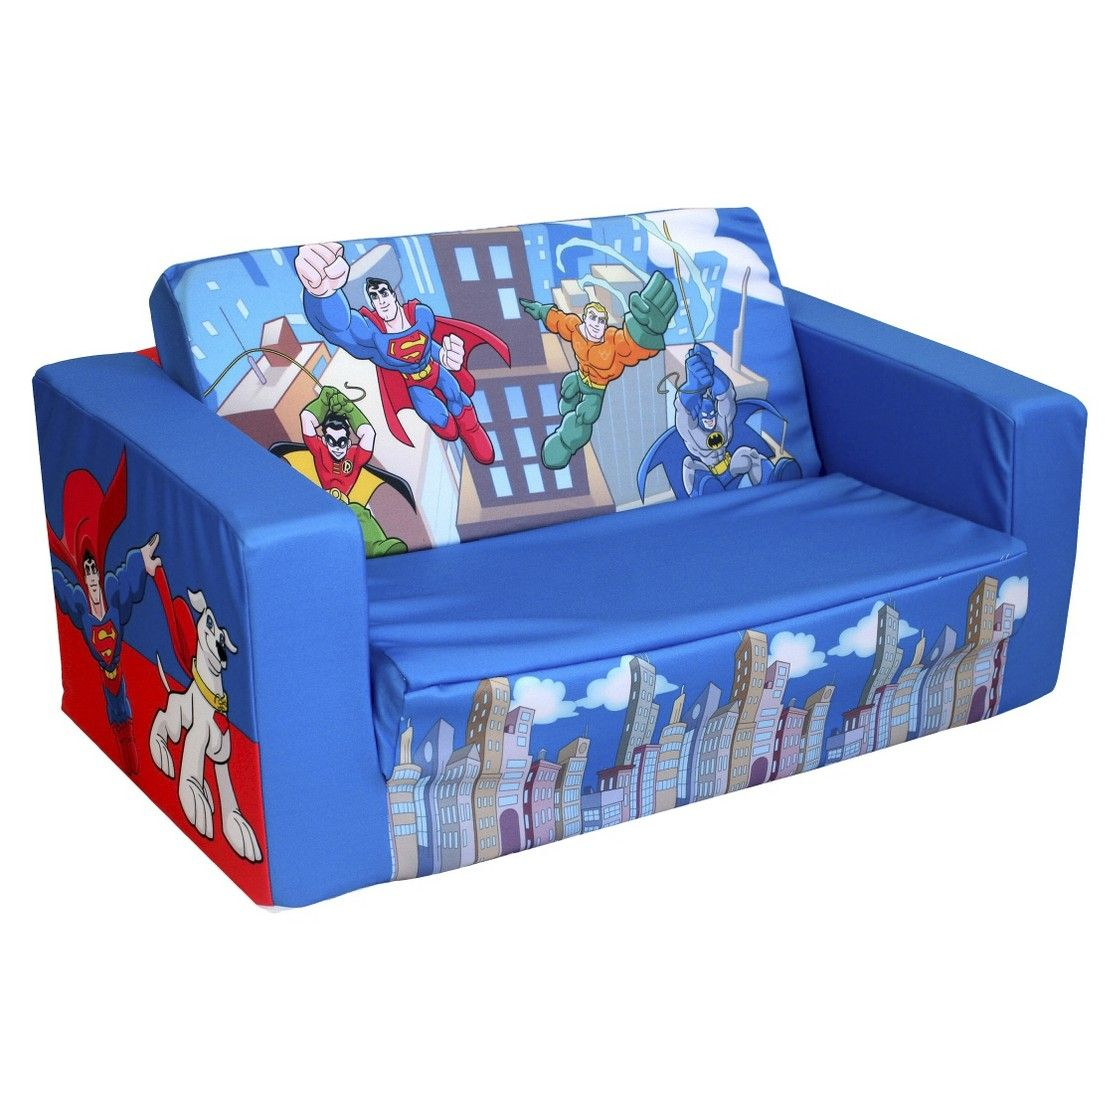 Enjoyable Magical Harmony Kids Flip Sofa Mini Heroes Kids Sofa Machost Co Dining Chair Design Ideas Machostcouk